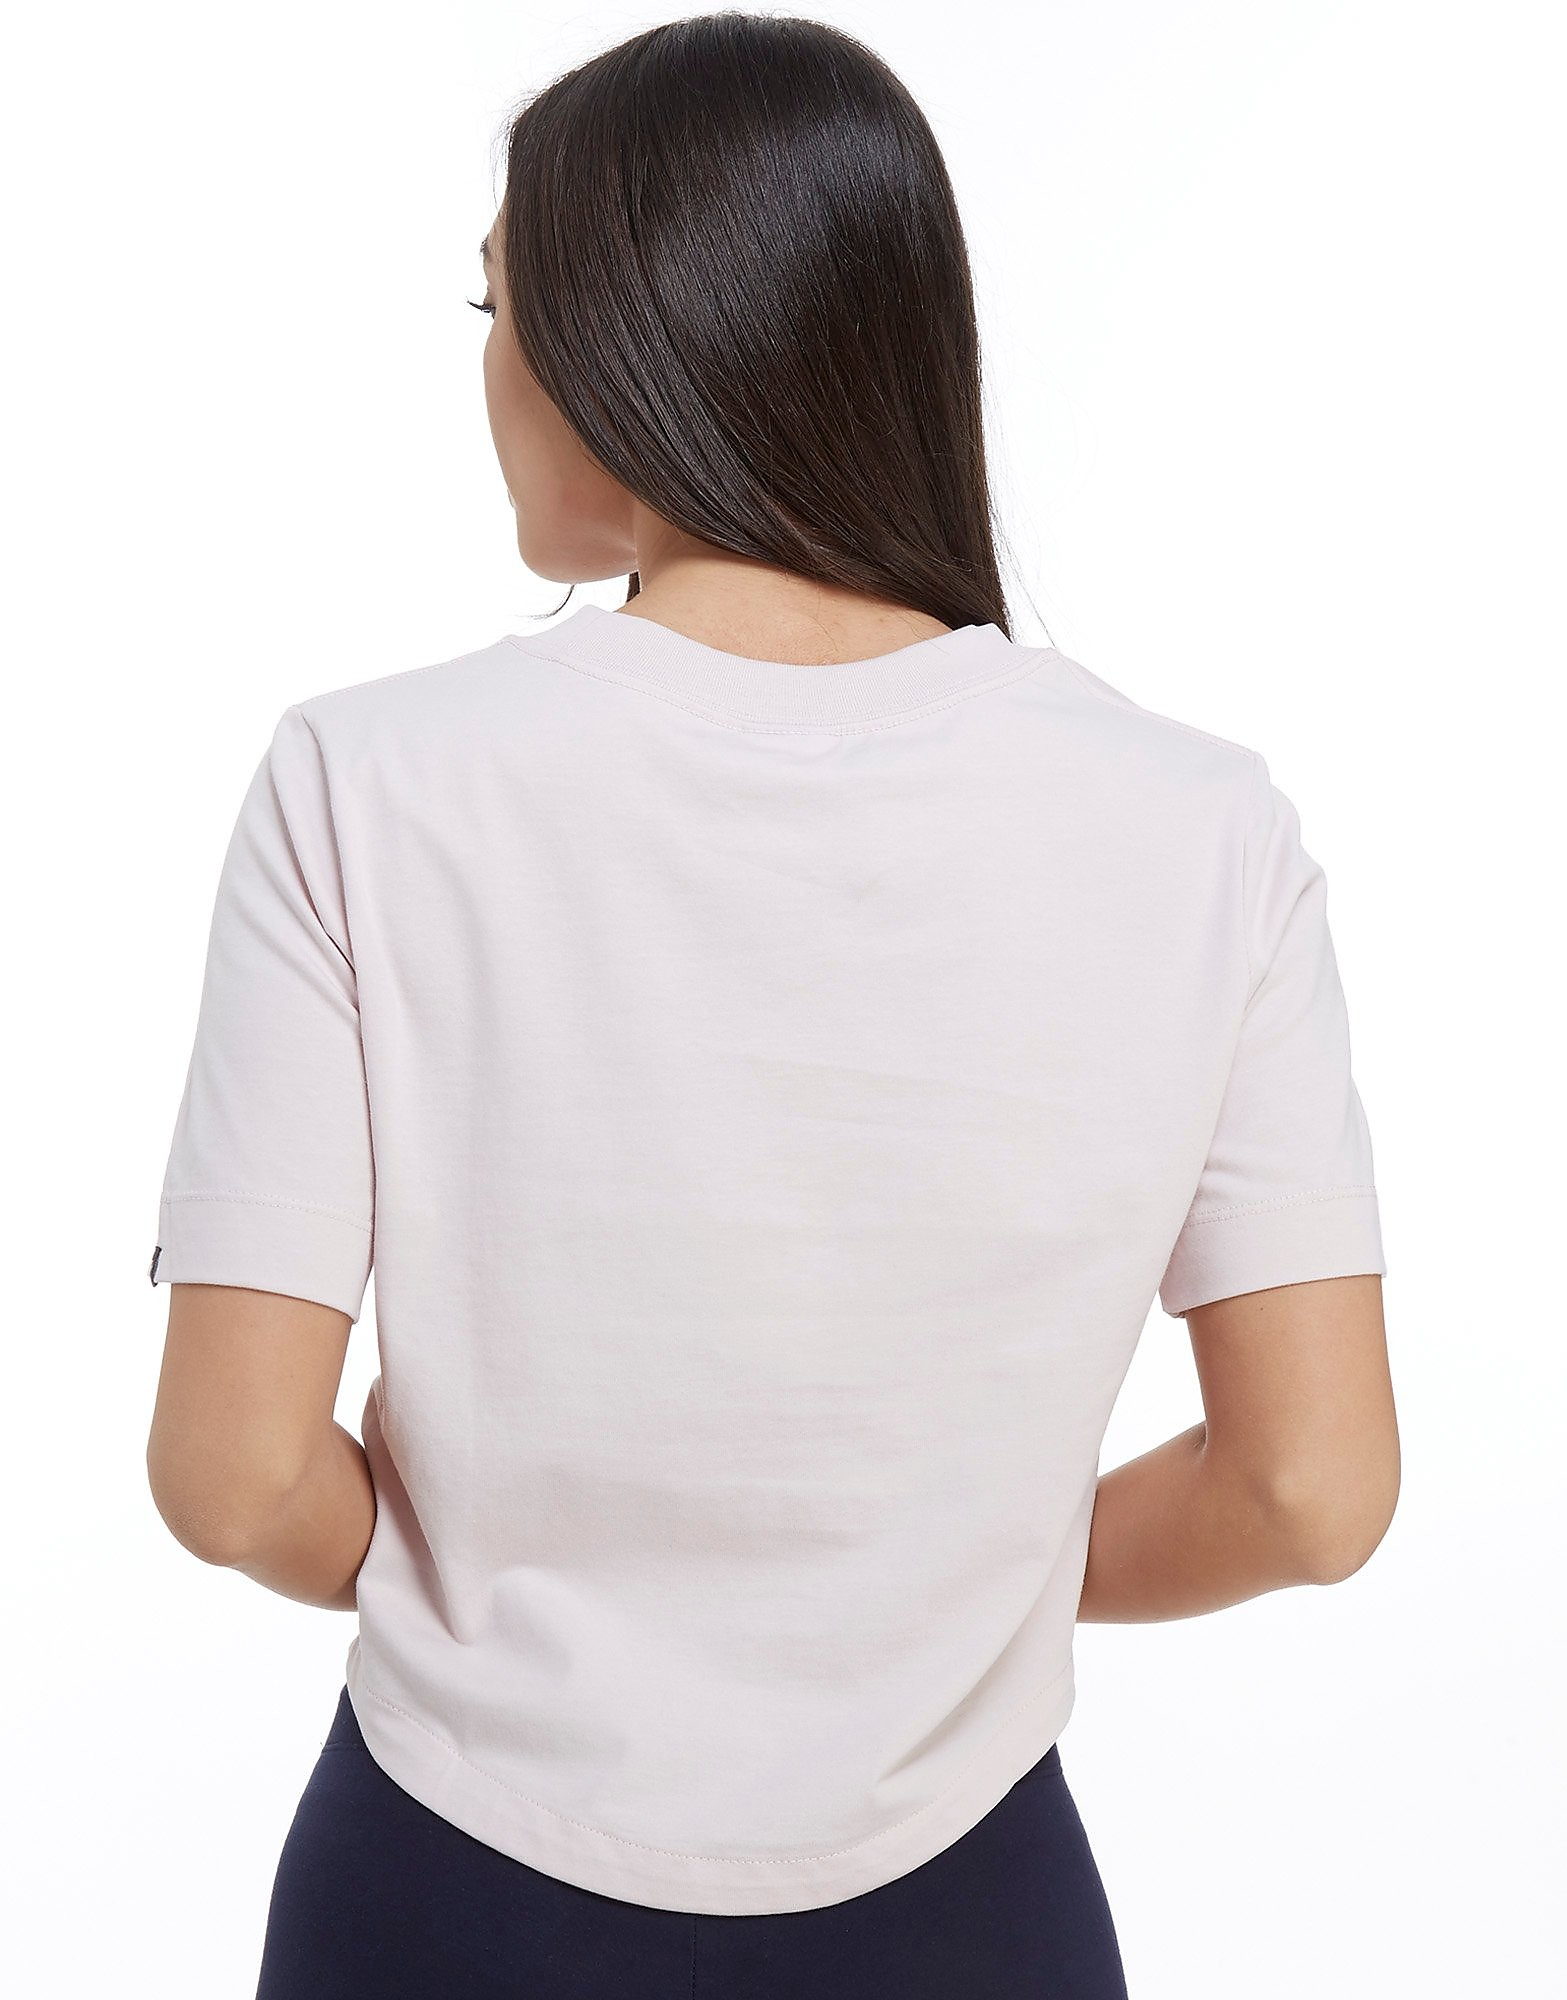 Nike camiseta Swoosh Box